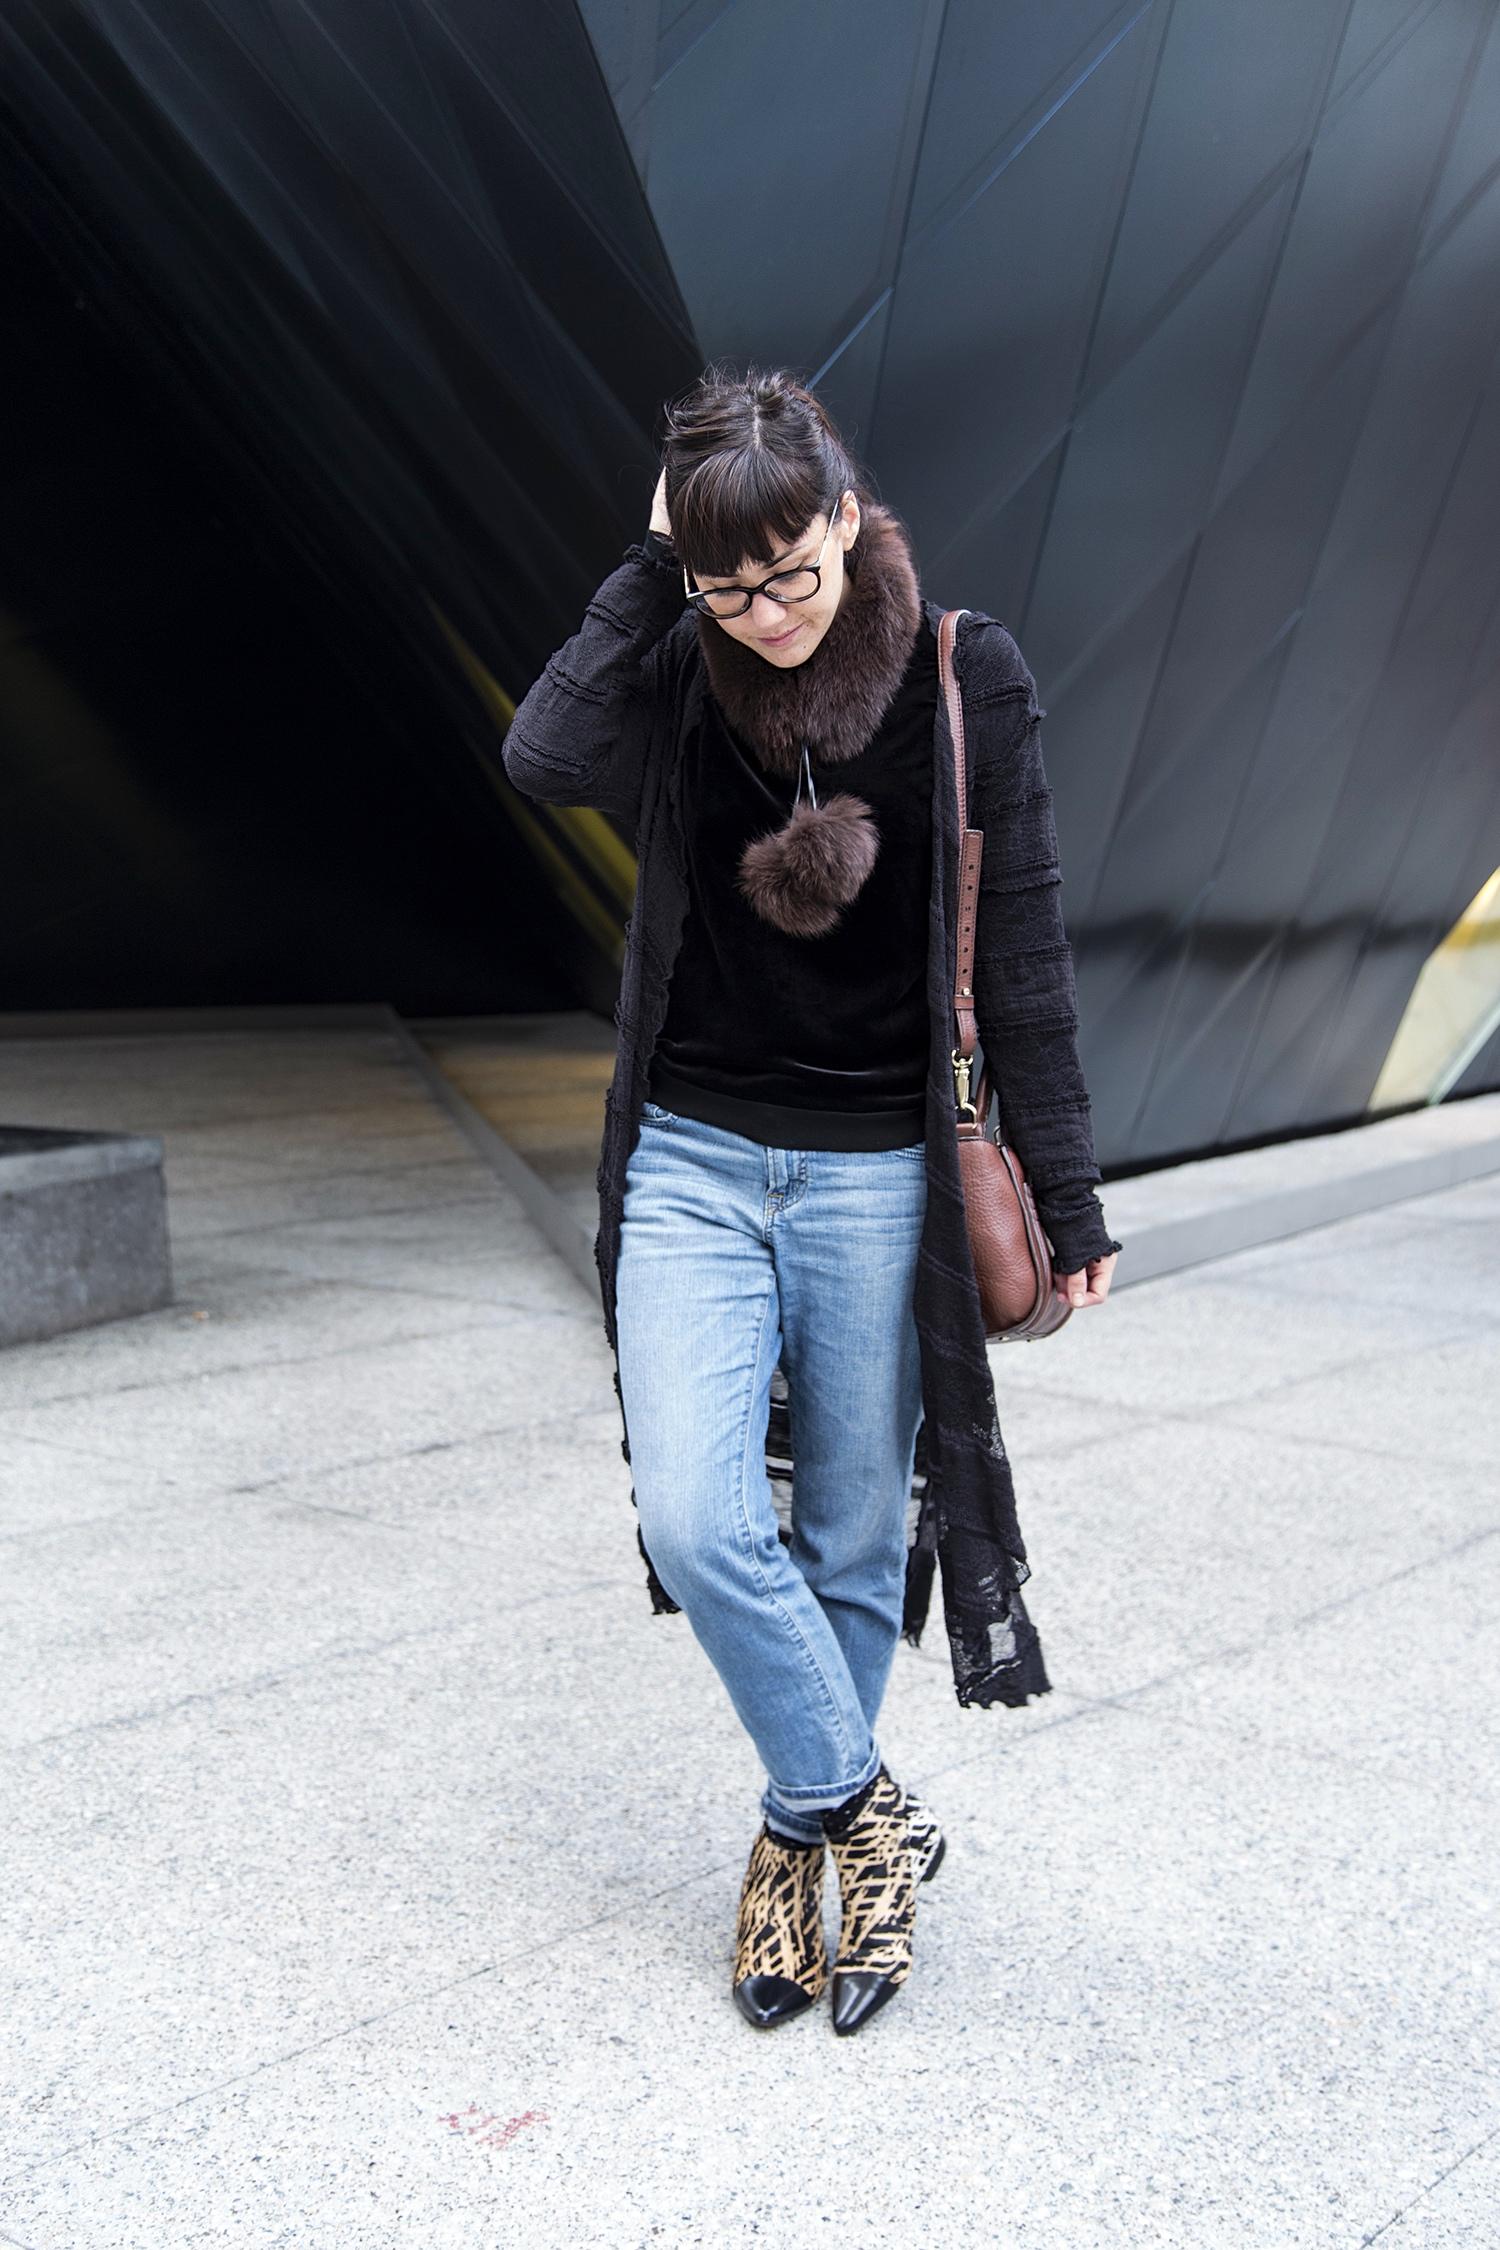 Lace Duster, Bare Necessities (an itty bitty boutique); Velvet Sweater:  Jigsaw London ; Boyfriend Jeans:  Uniqlo ; Bag: Kate Spade; Austin Boot: 10 Crosby by Derek Lam, via Marshalls; Fur Collar, Vintage